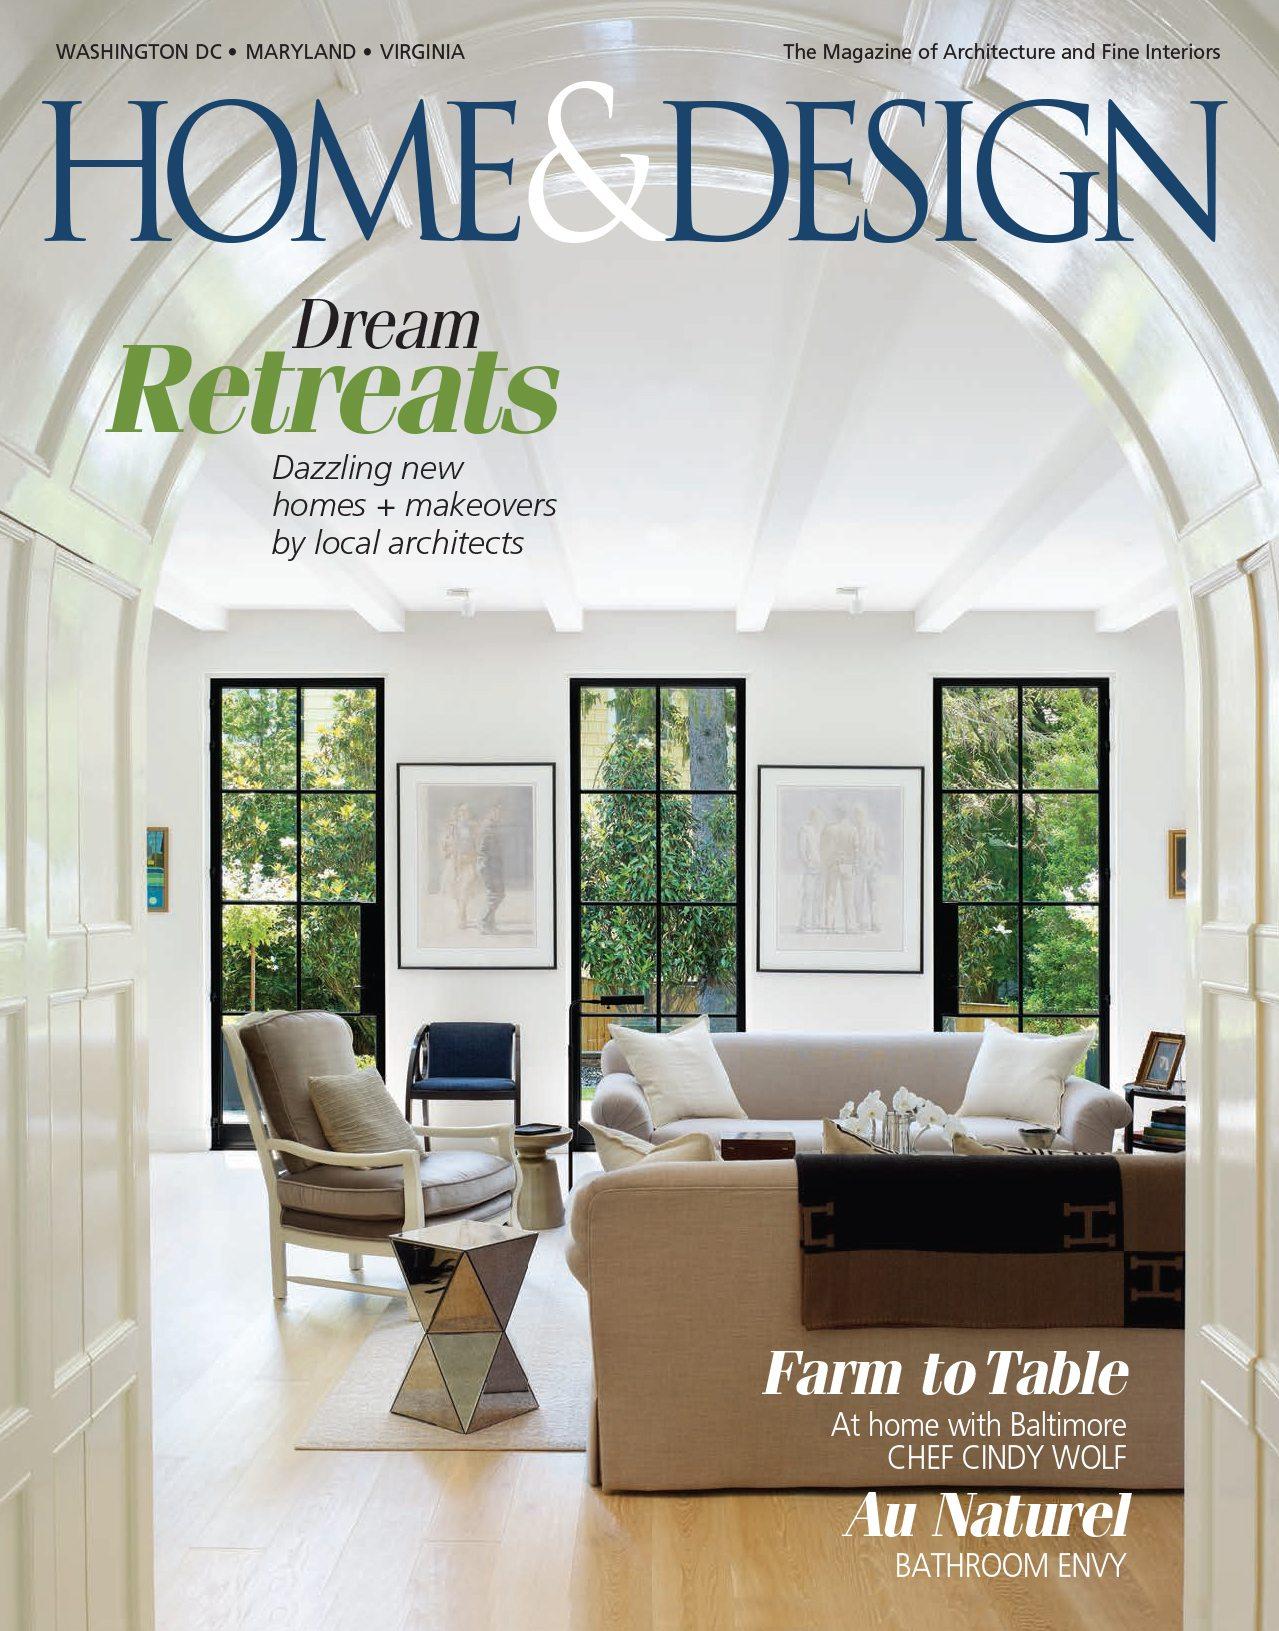 Best Kitchen Gallery: September October 2016 Archives Home Design Magazine of Home By Design Magazine  on rachelxblog.com